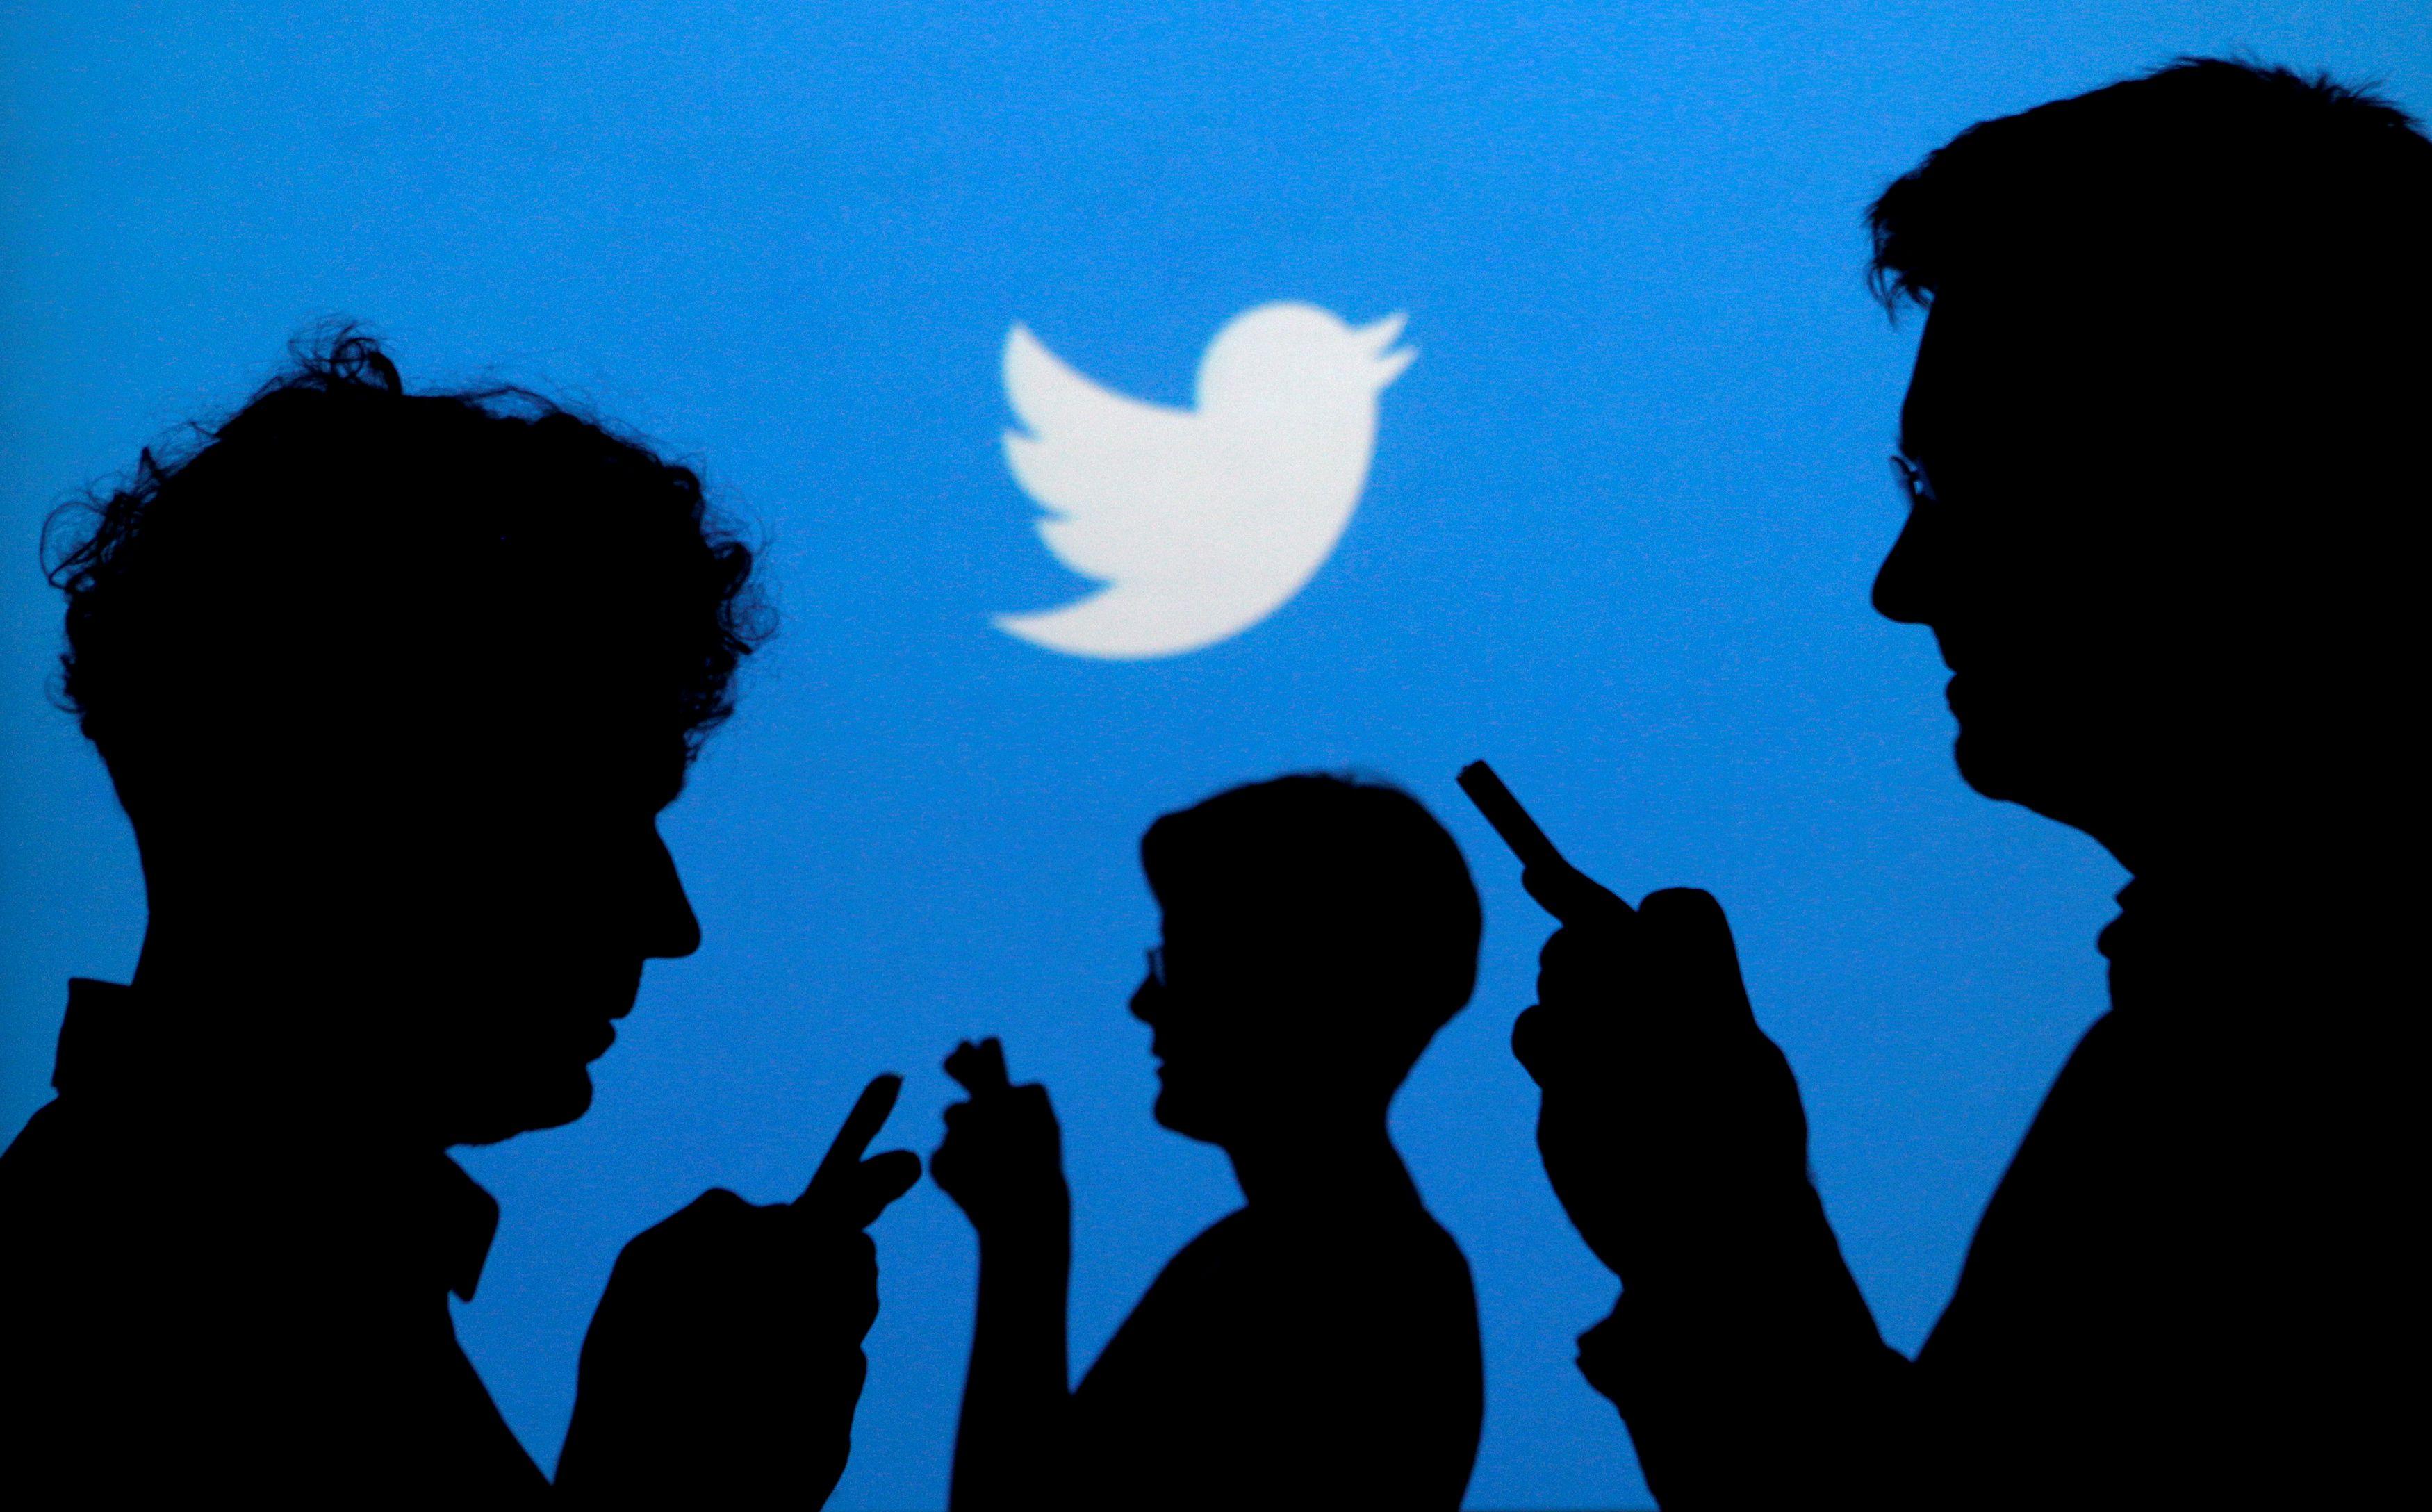 La red social anuncnió los criterios de verificación (REUTERS/Kacper Pempel/Illustration/File Photo)